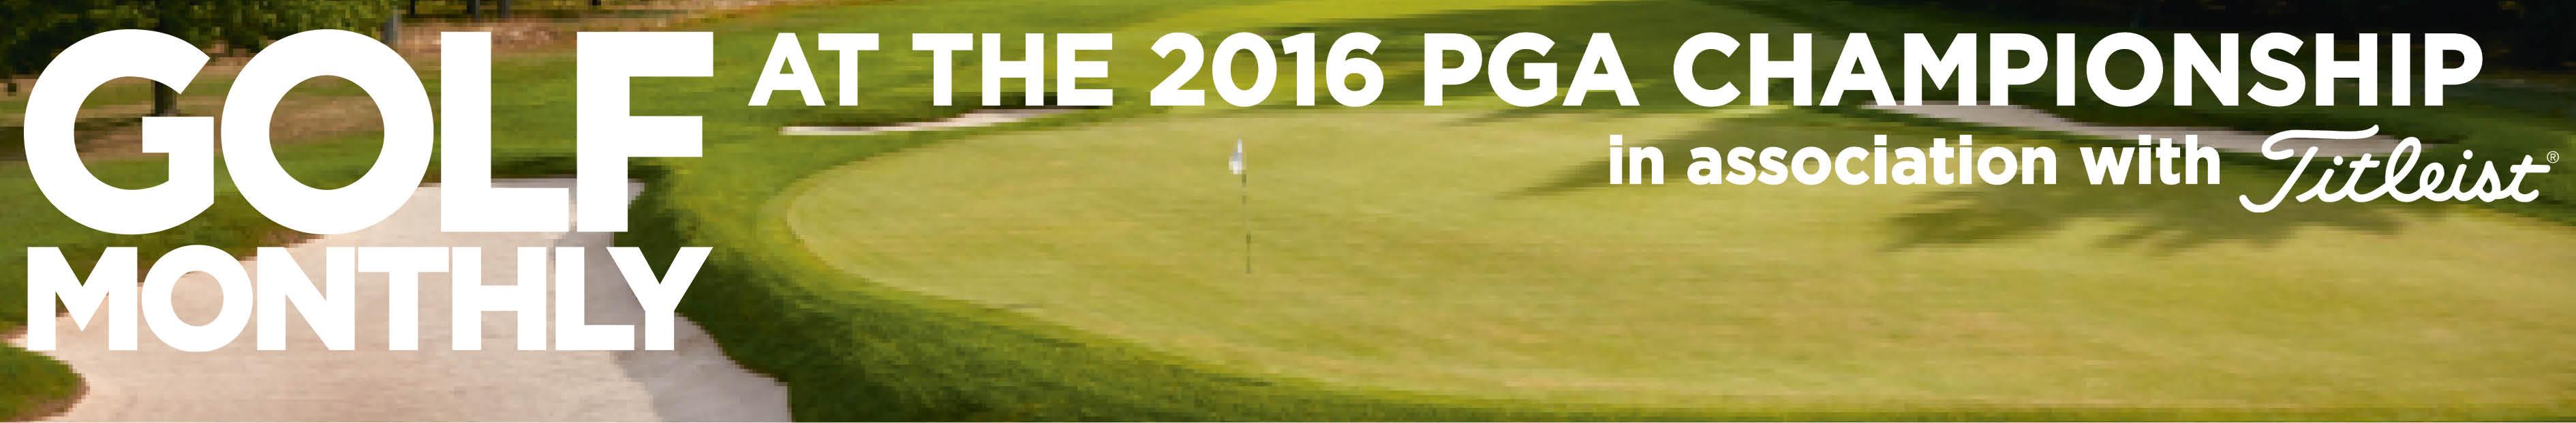 USPGA 2016